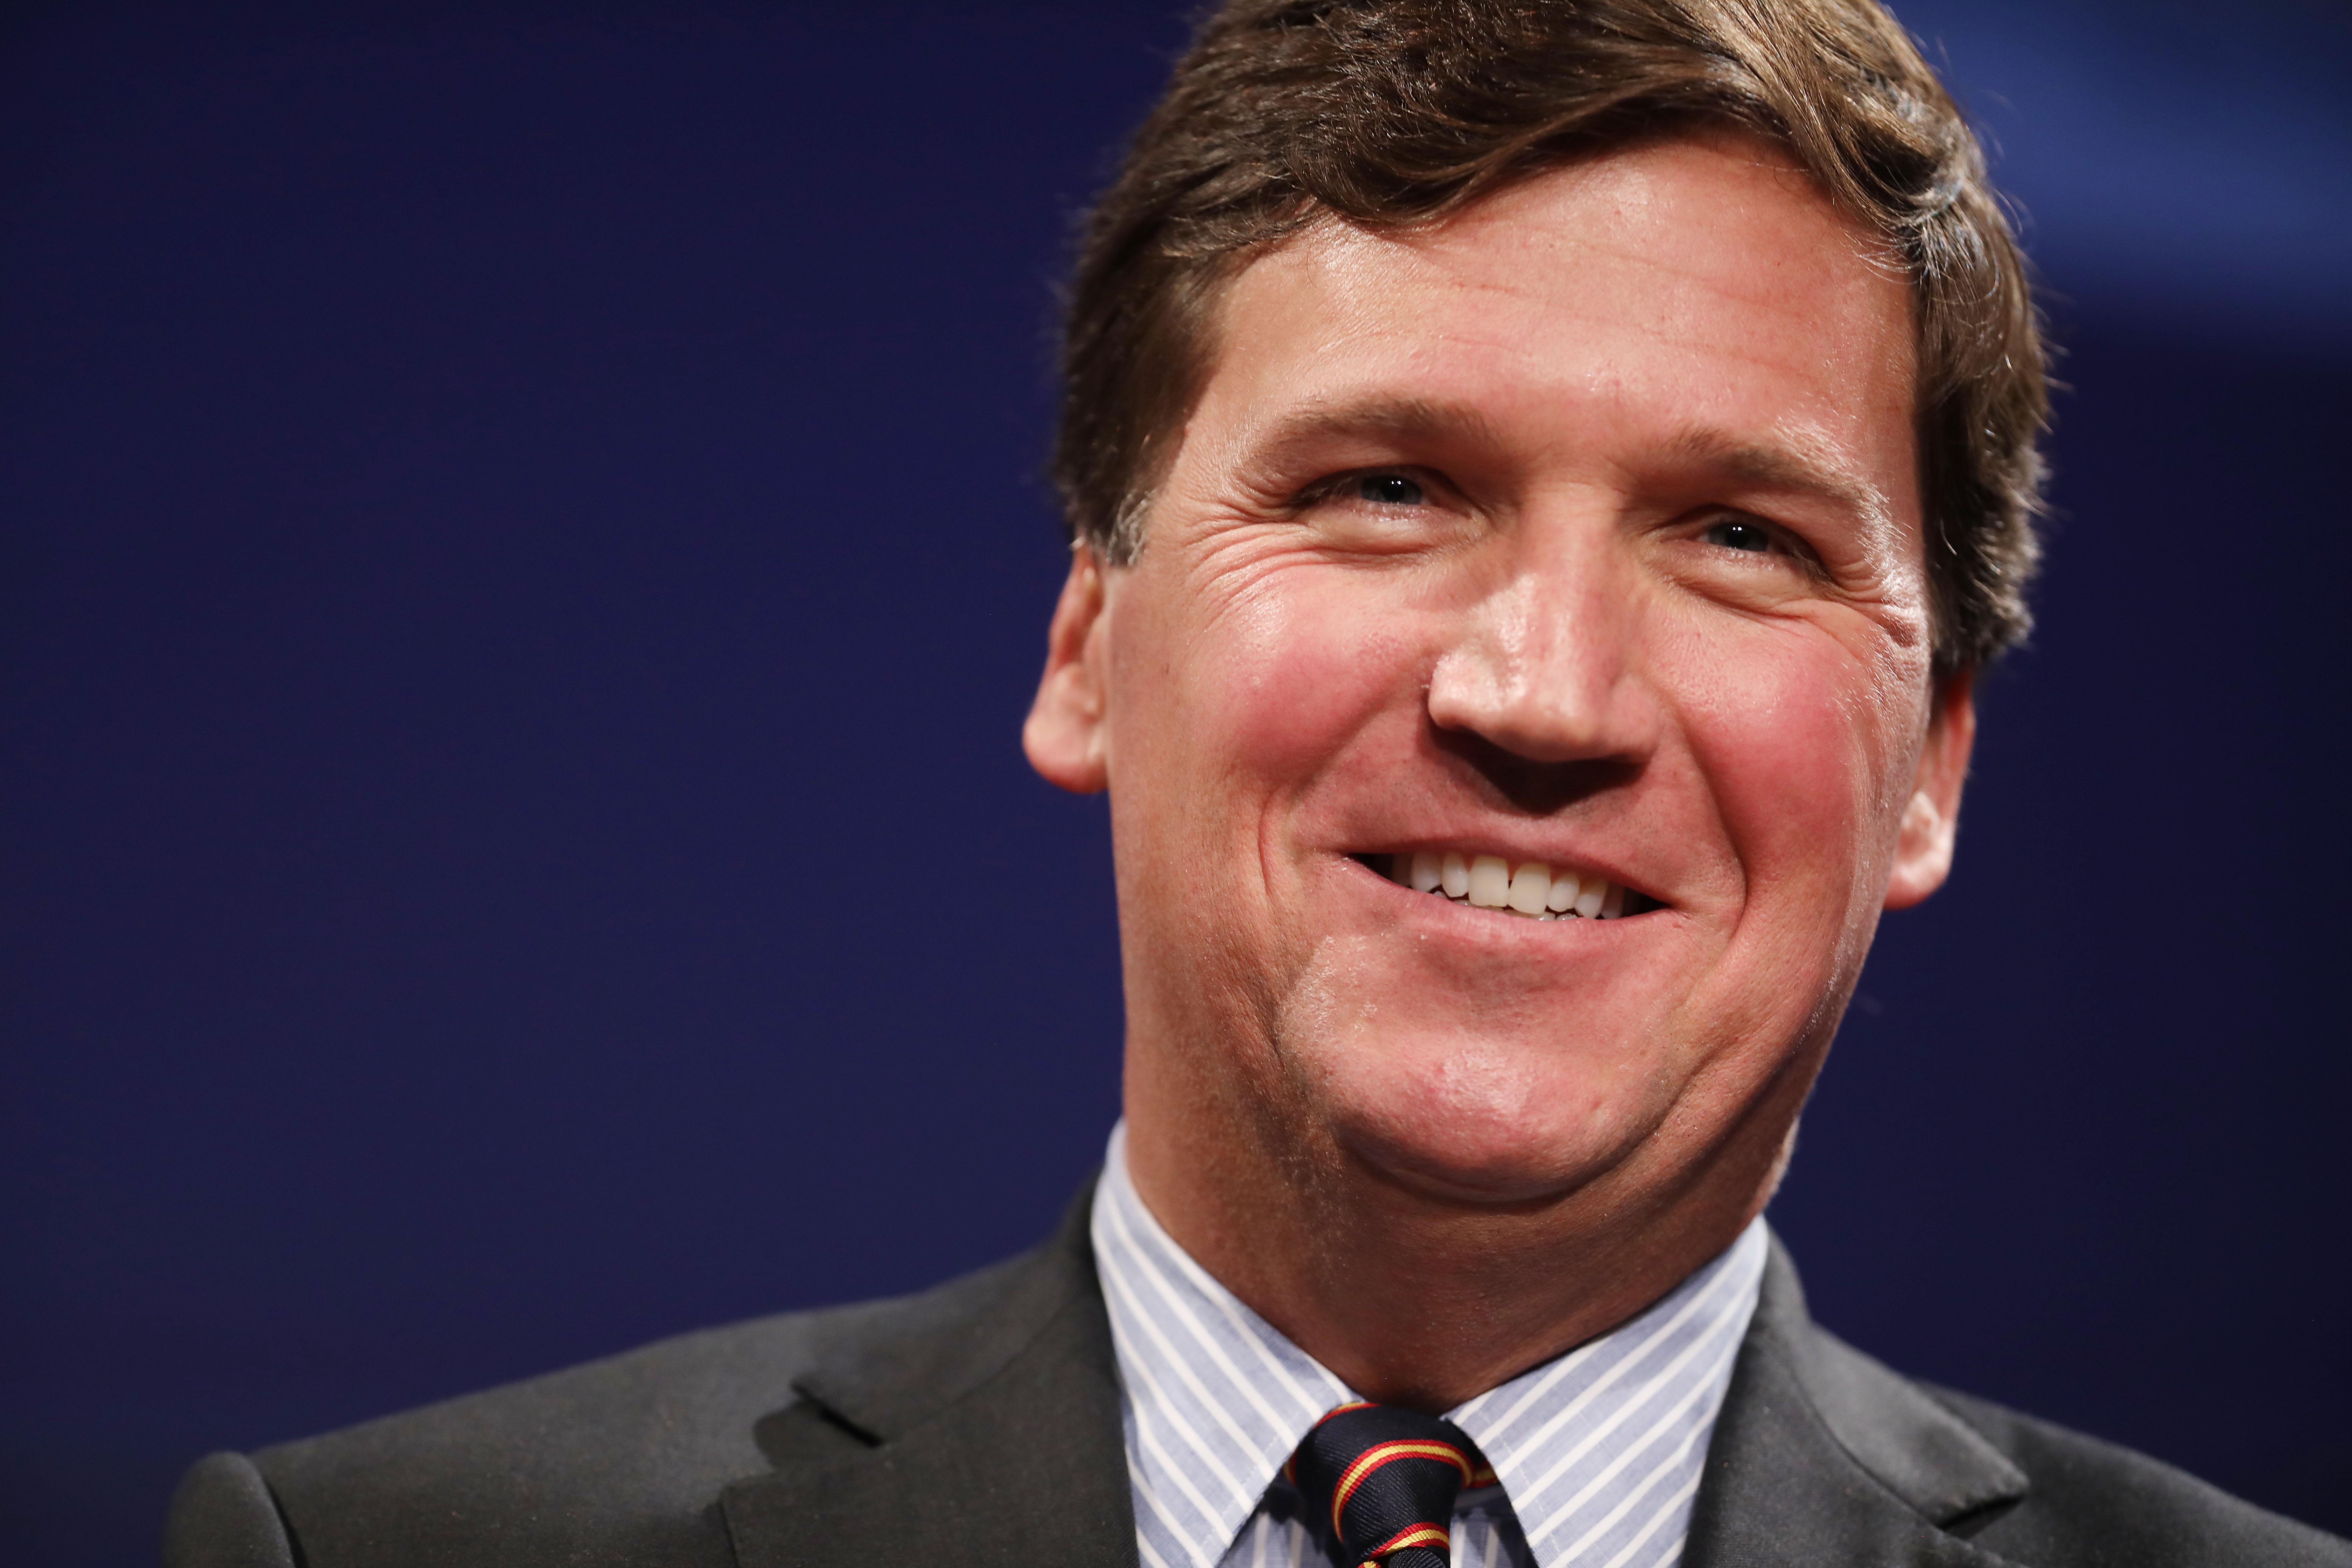 , ICYMI Tucker Carlson Endorsed a Core Belief of White Supremacy Last Night, Saubio Making Wealth